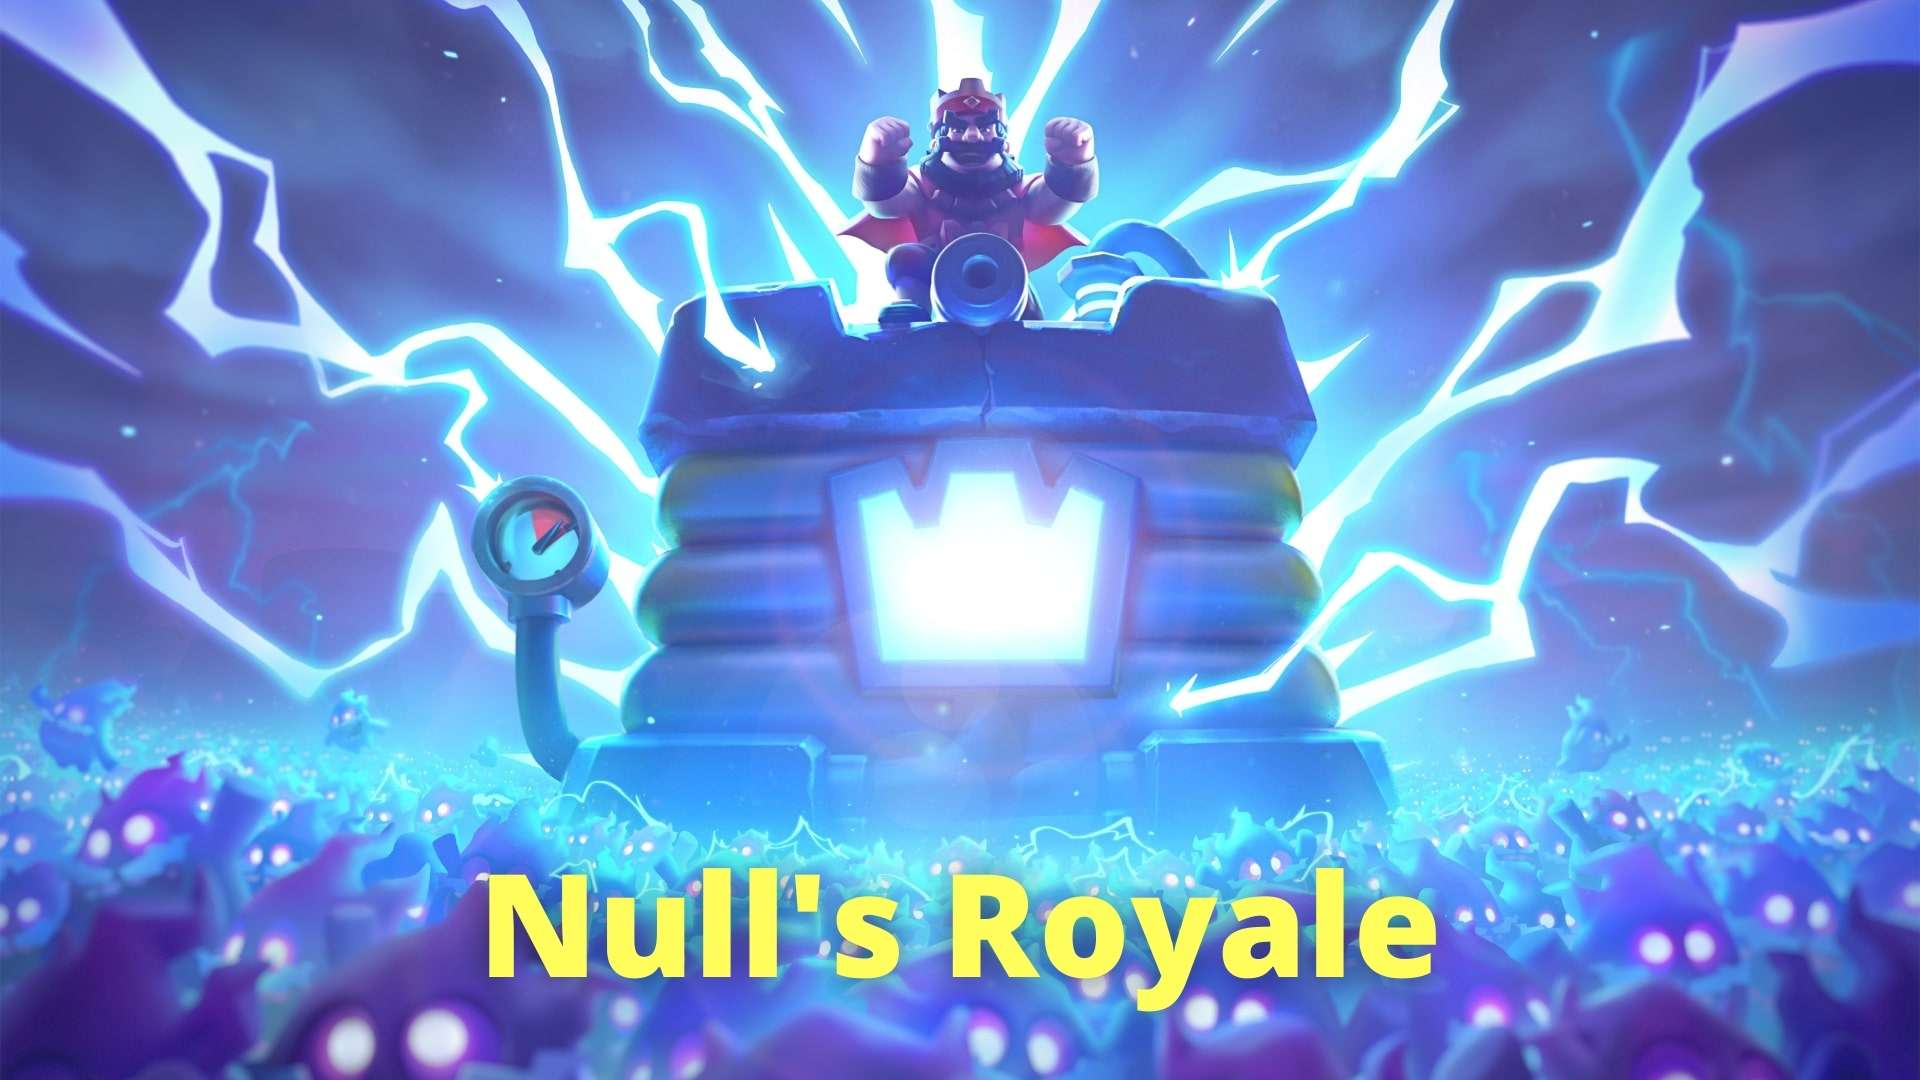 nulls royale